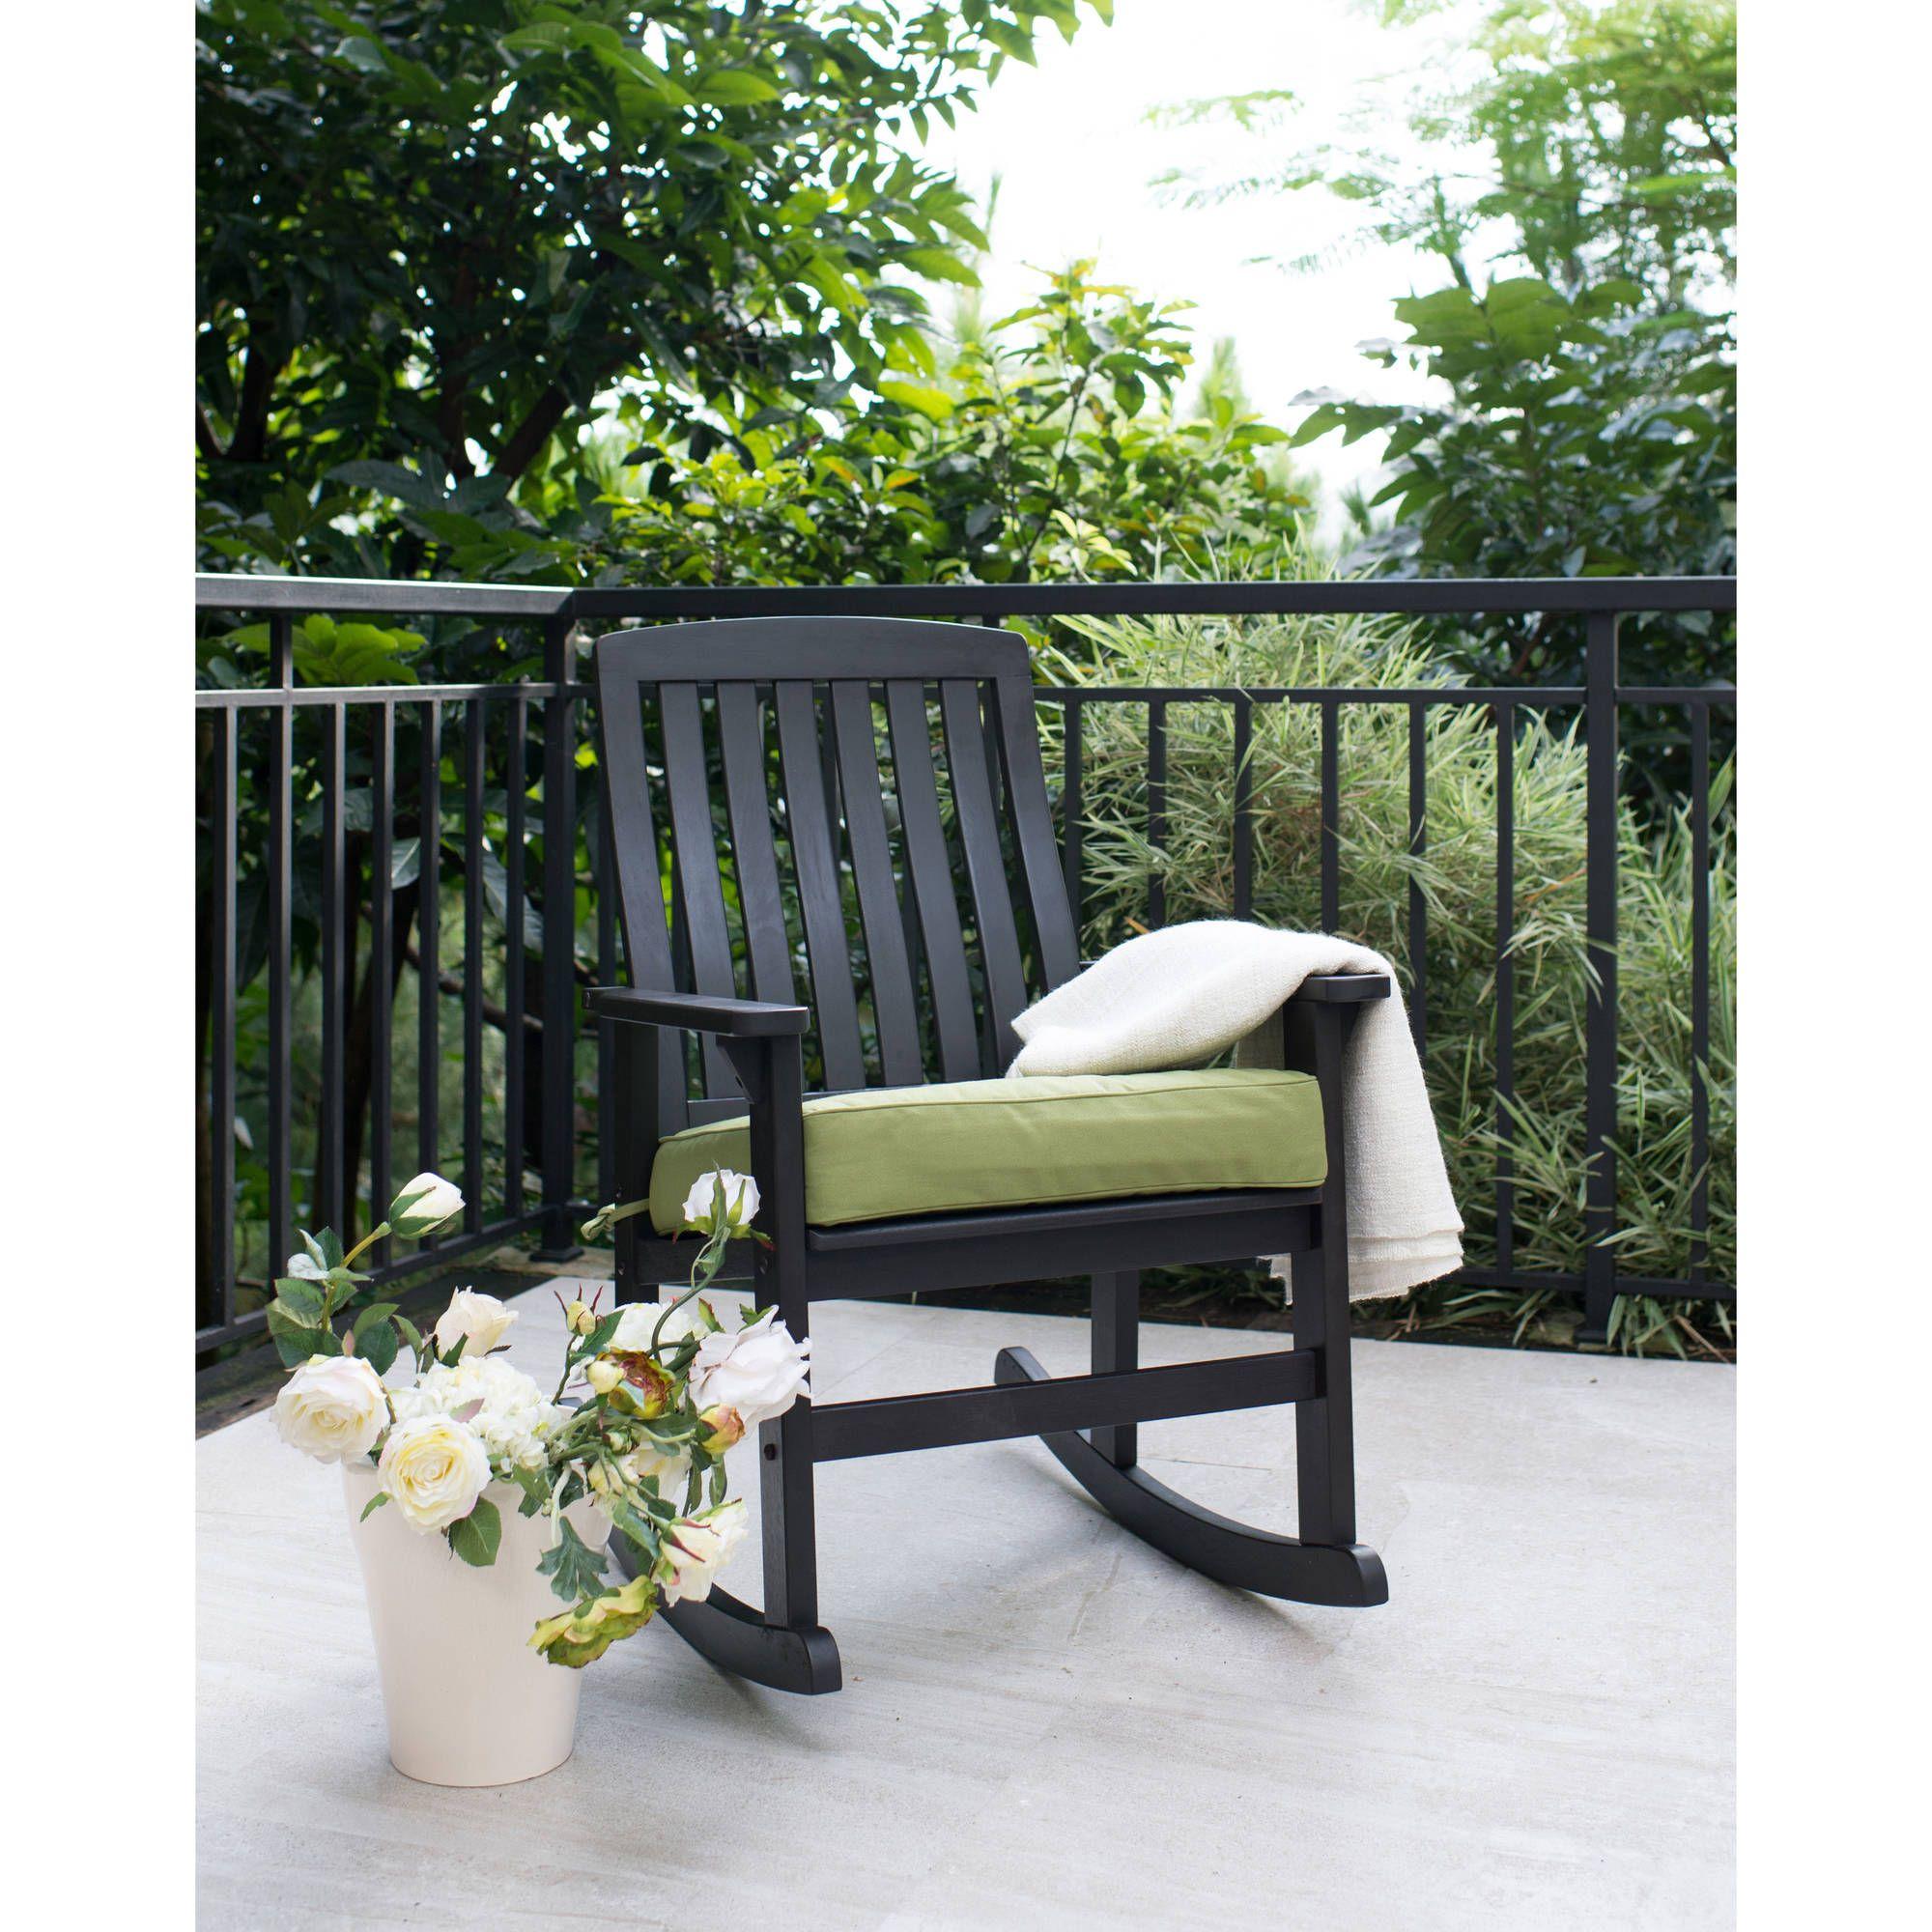 Patio & Garden Rocking chair porch, Outdoor rocking